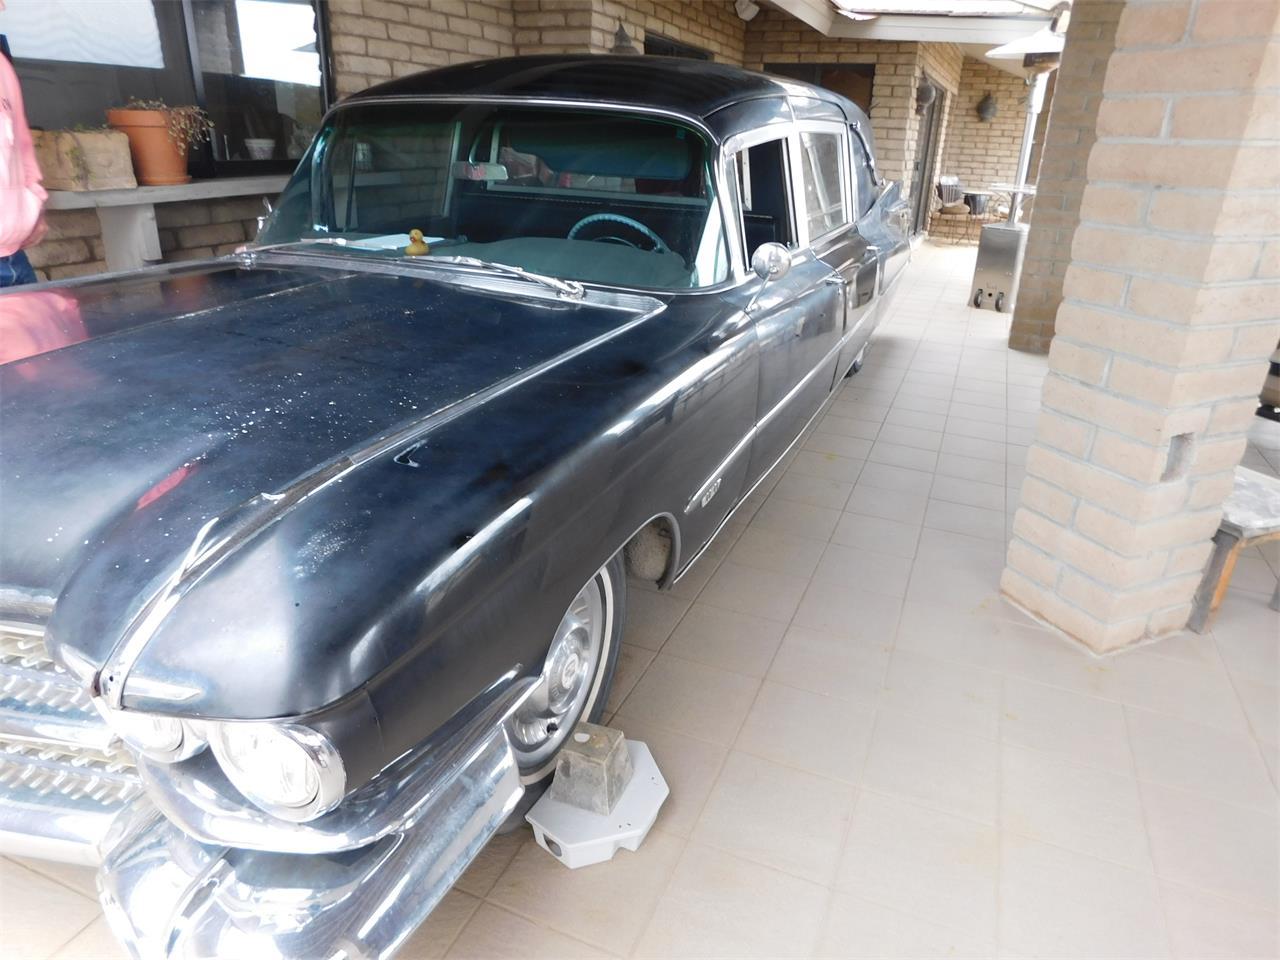 1959 Cadillac Hearse for Sale   ClassicCars.com   CC-1070862